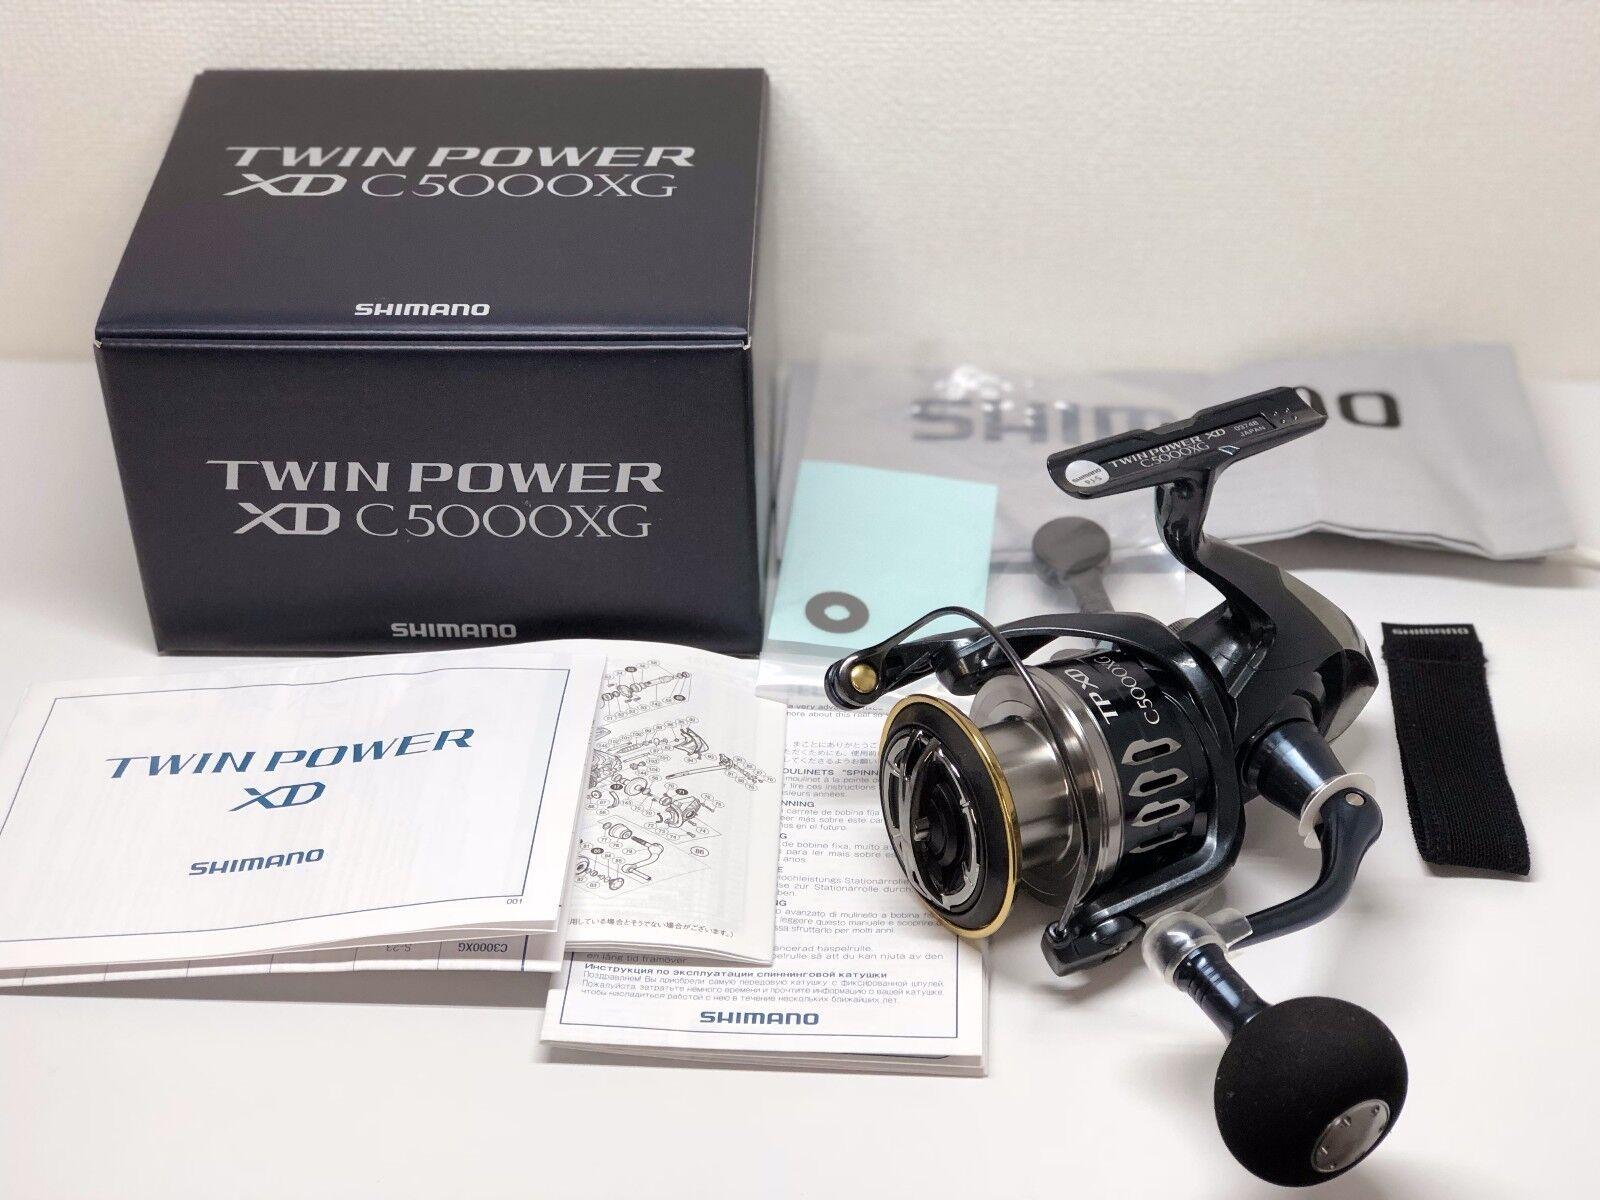 SHIMANO 17 TWINPOWER TWINPOWER TWINPOWER XD C5000XG   - Free Shipping from Japan 48dc51